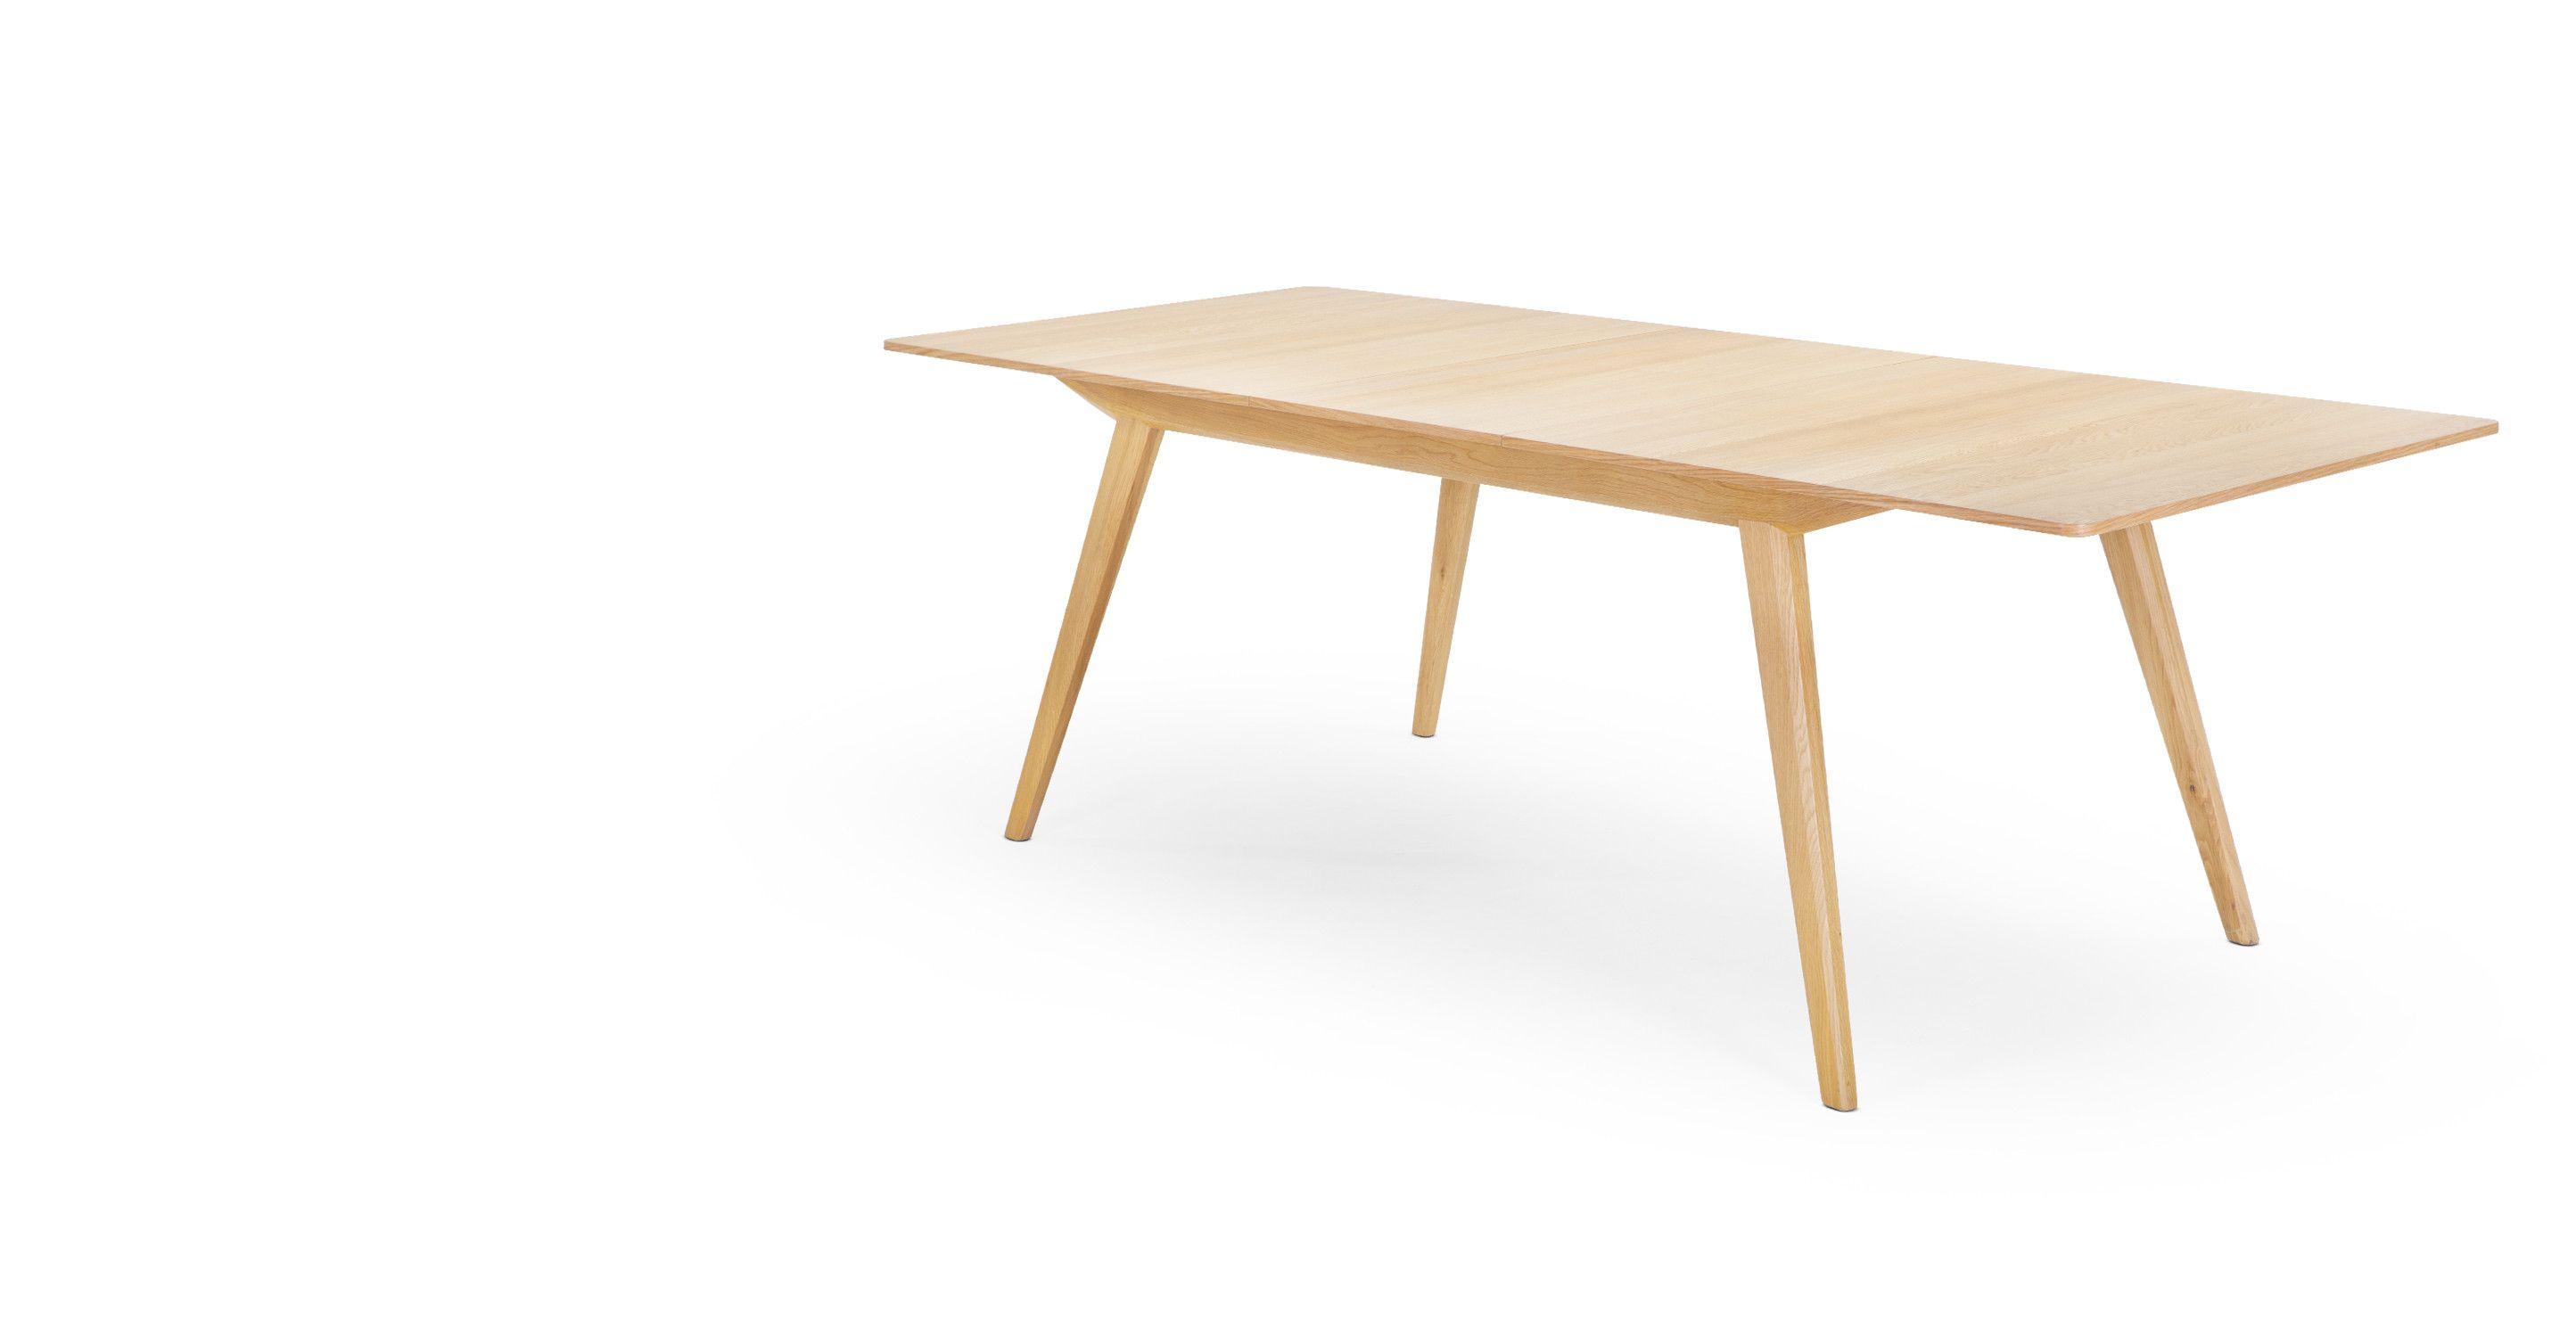 Jenson une table  rallonge chªne made